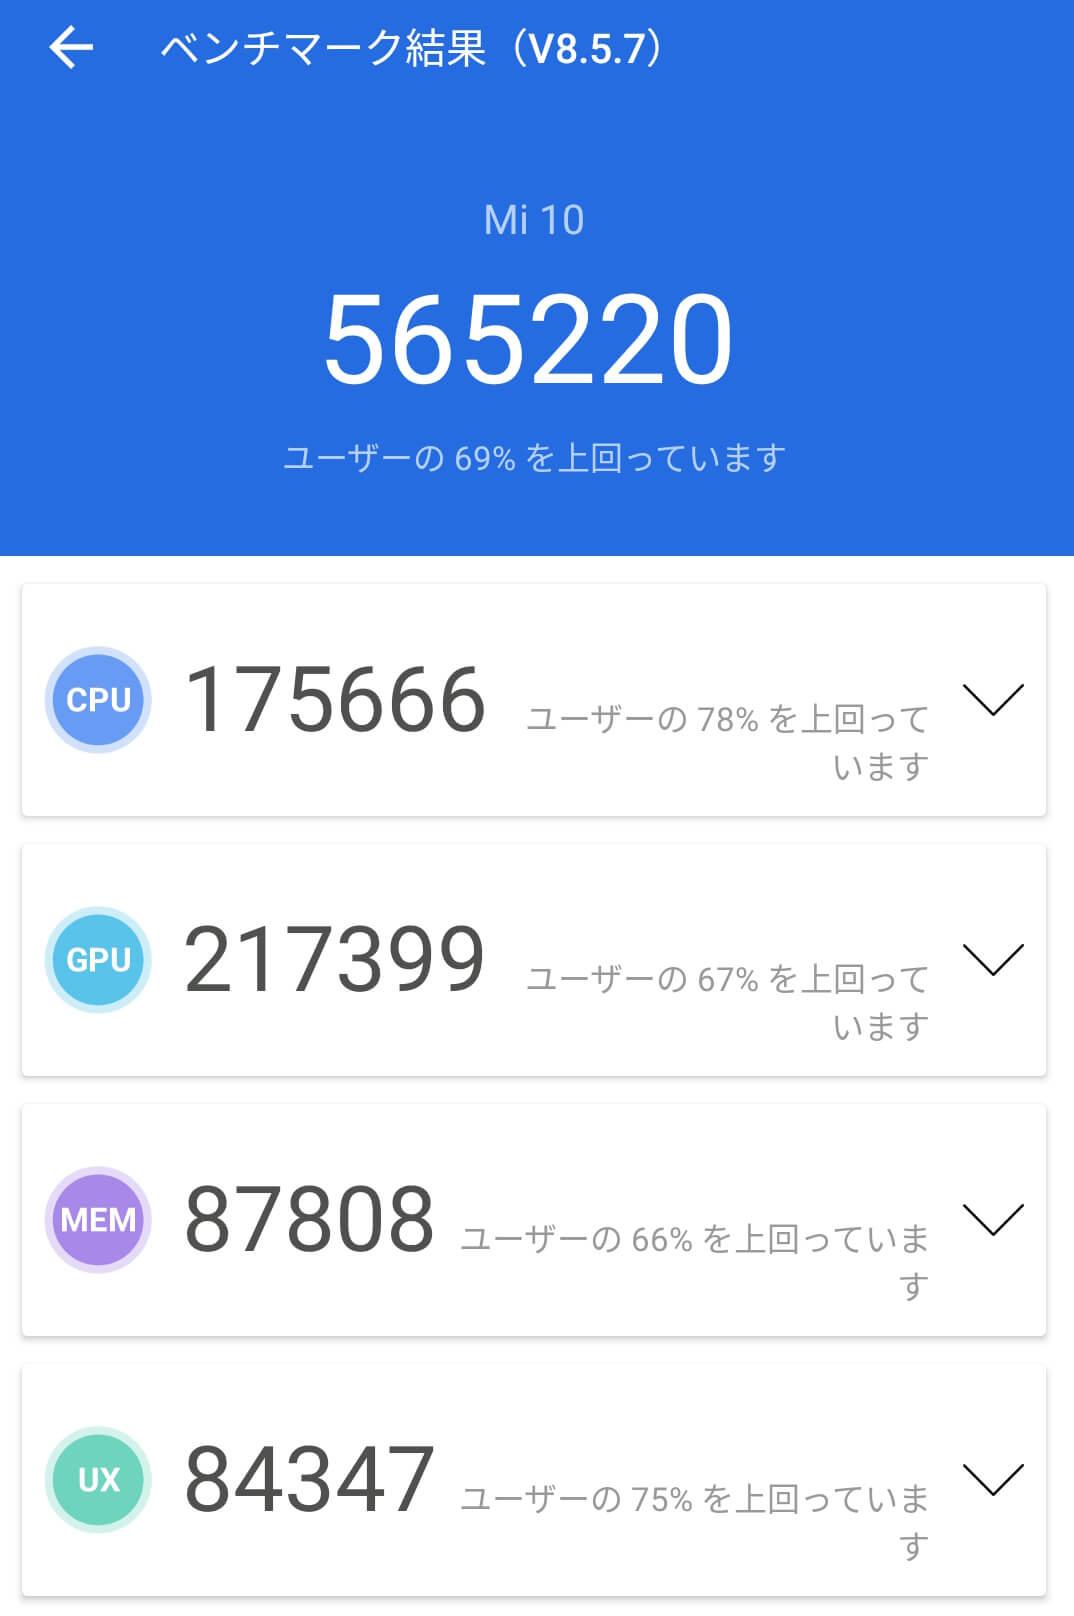 Xiaomi Mi 10のAntutuベンチマークスコア計測2回目は565220